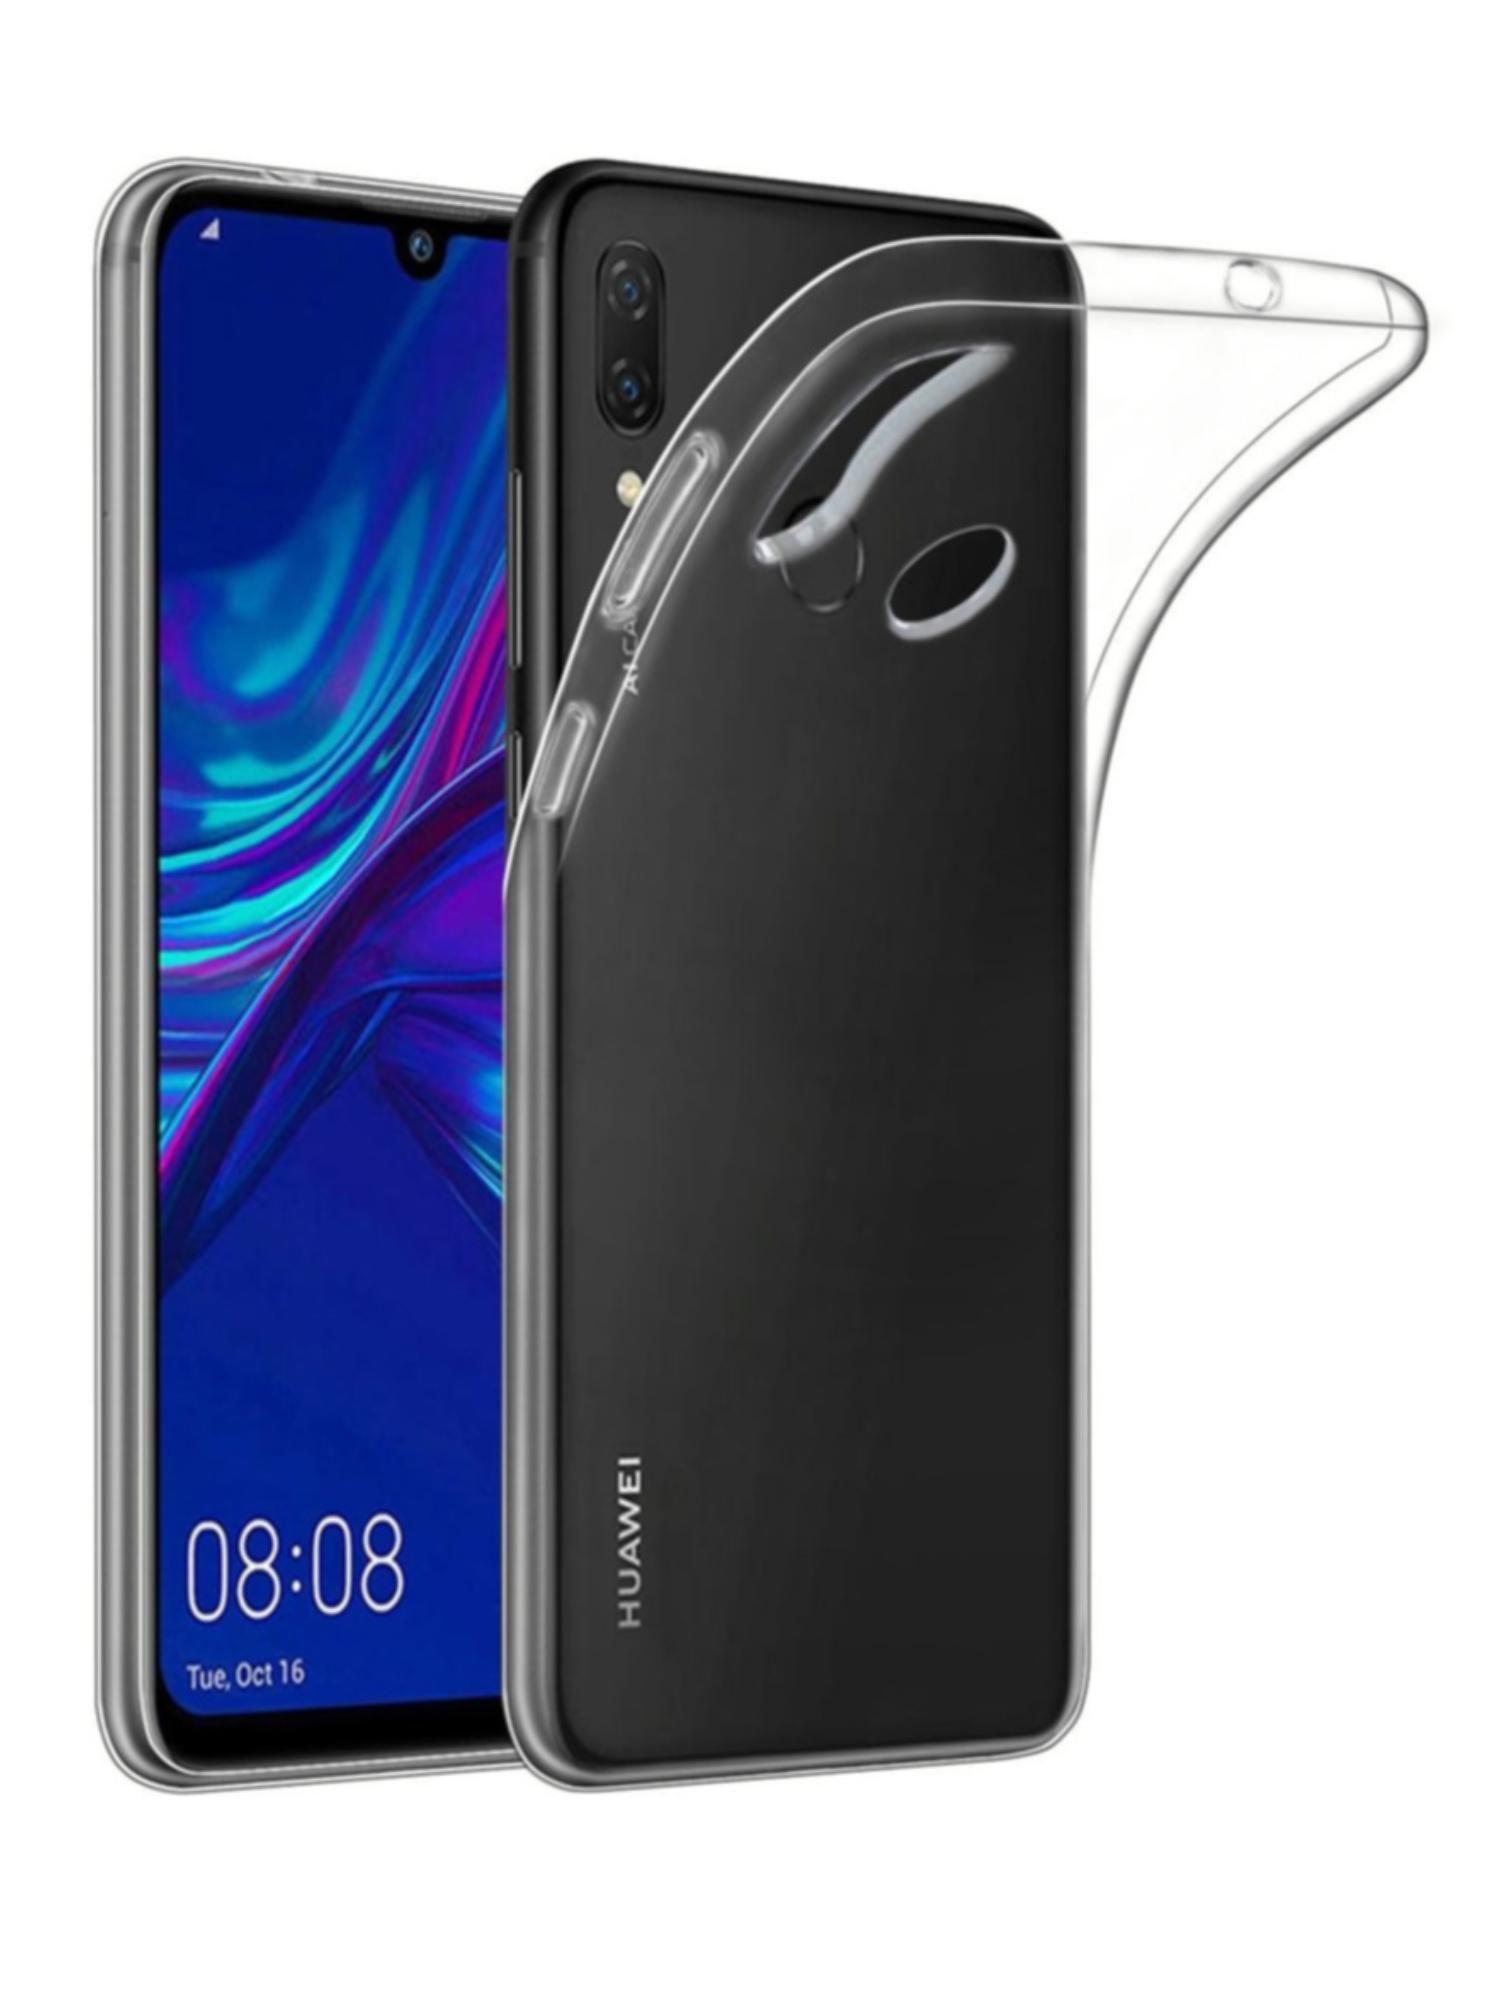 Dificil Porque apetito  Cheap Chance of Funda de gel TPU carcasa silicona para movil Huawei P Smart  2019 Transparente in 2020 | Silicone cover, Soft silicone, Huawei